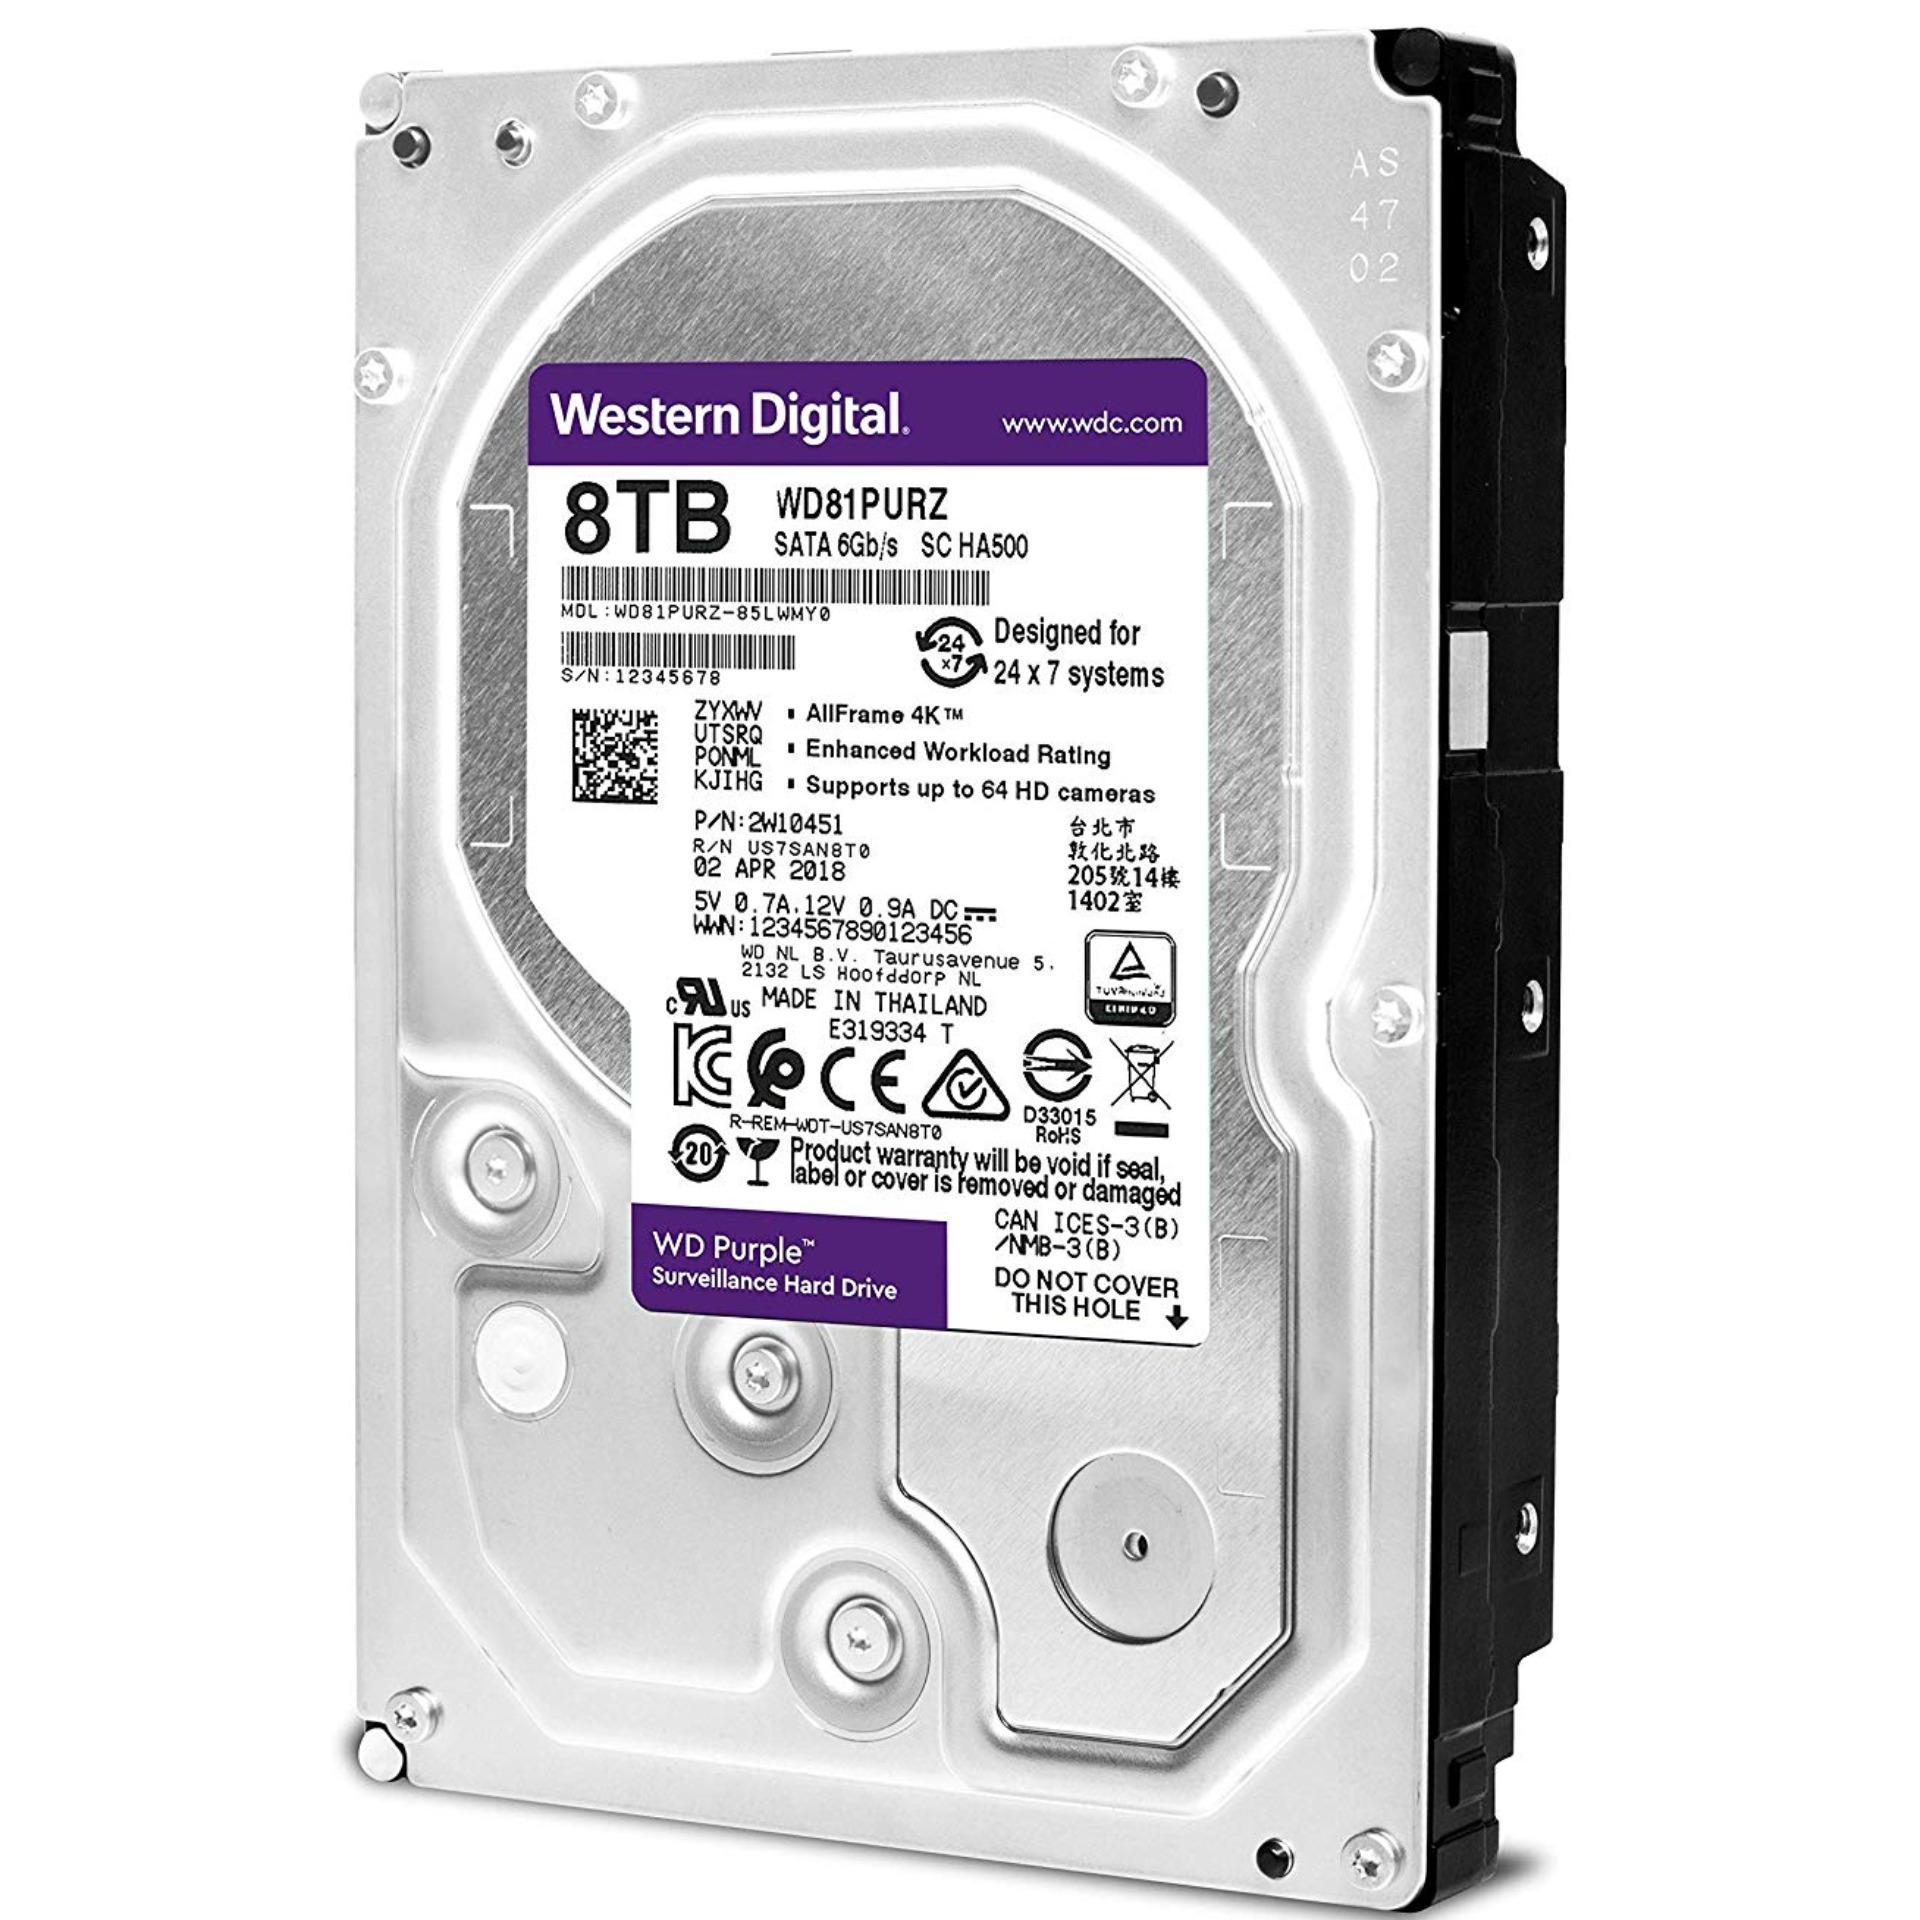 Western Digital WD Purple 8TB (Surveillance)